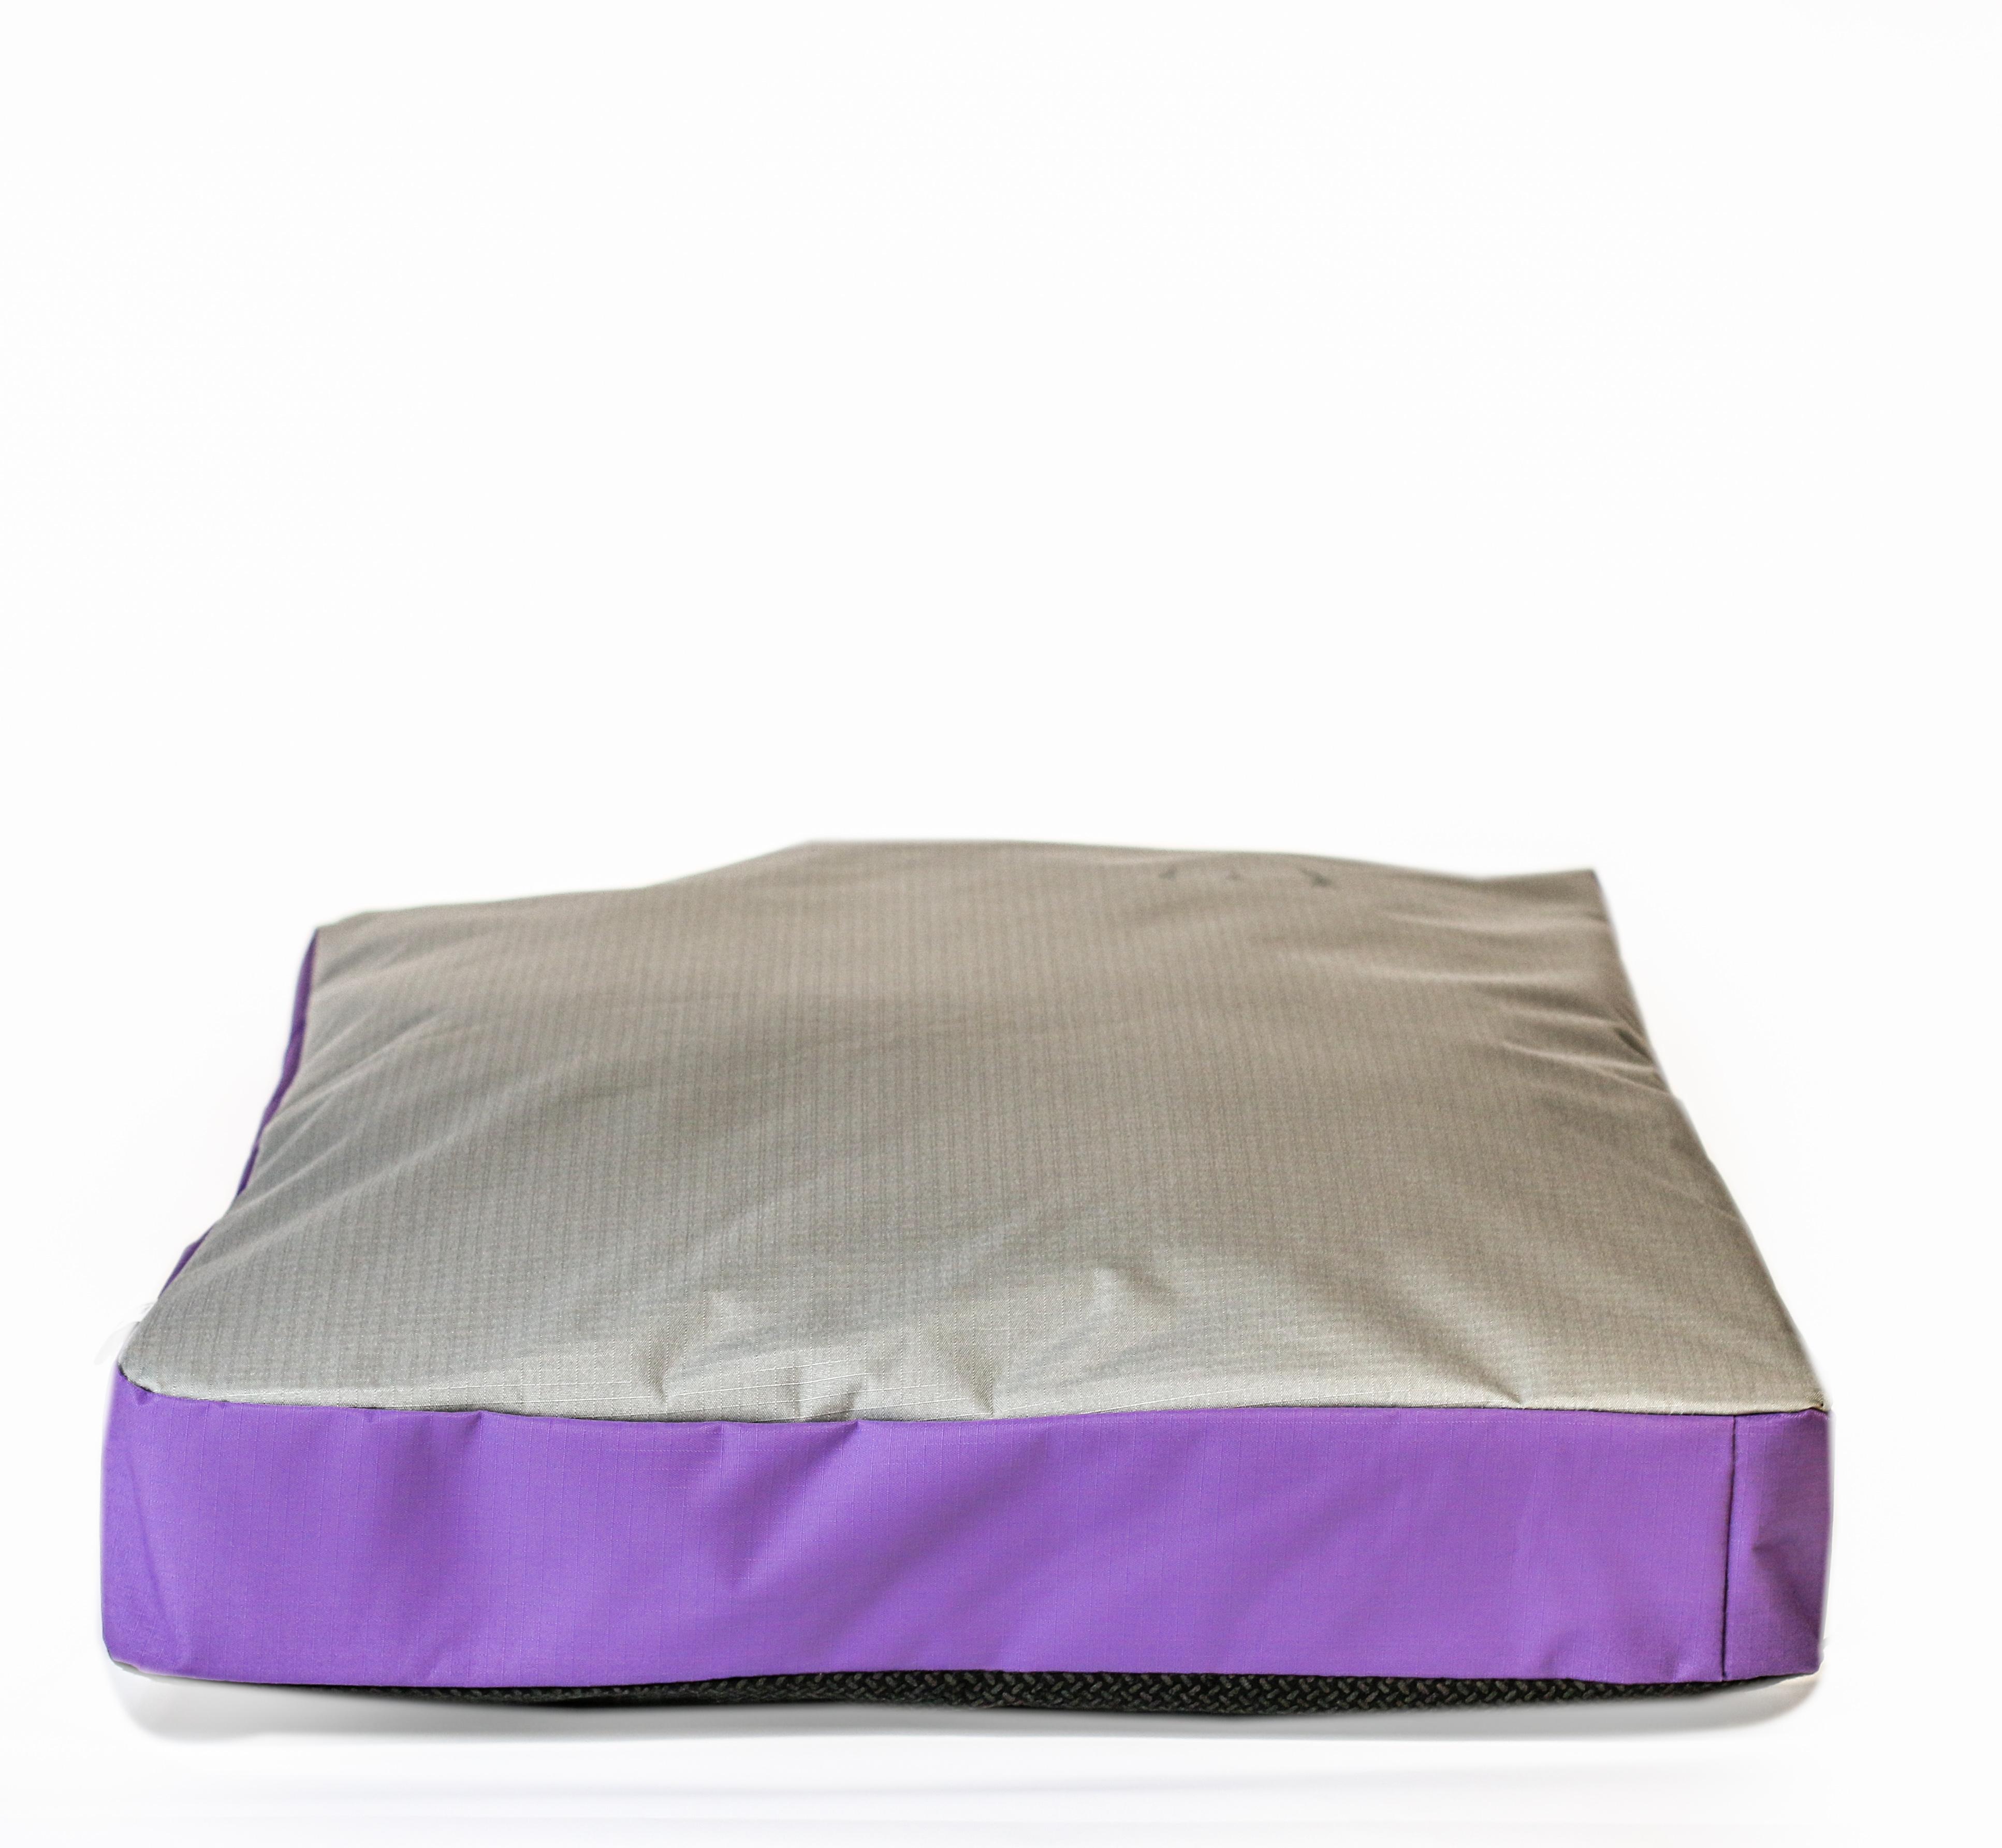 Cushion Java Rettangolare Futura 140x90x14 Cm Naturally